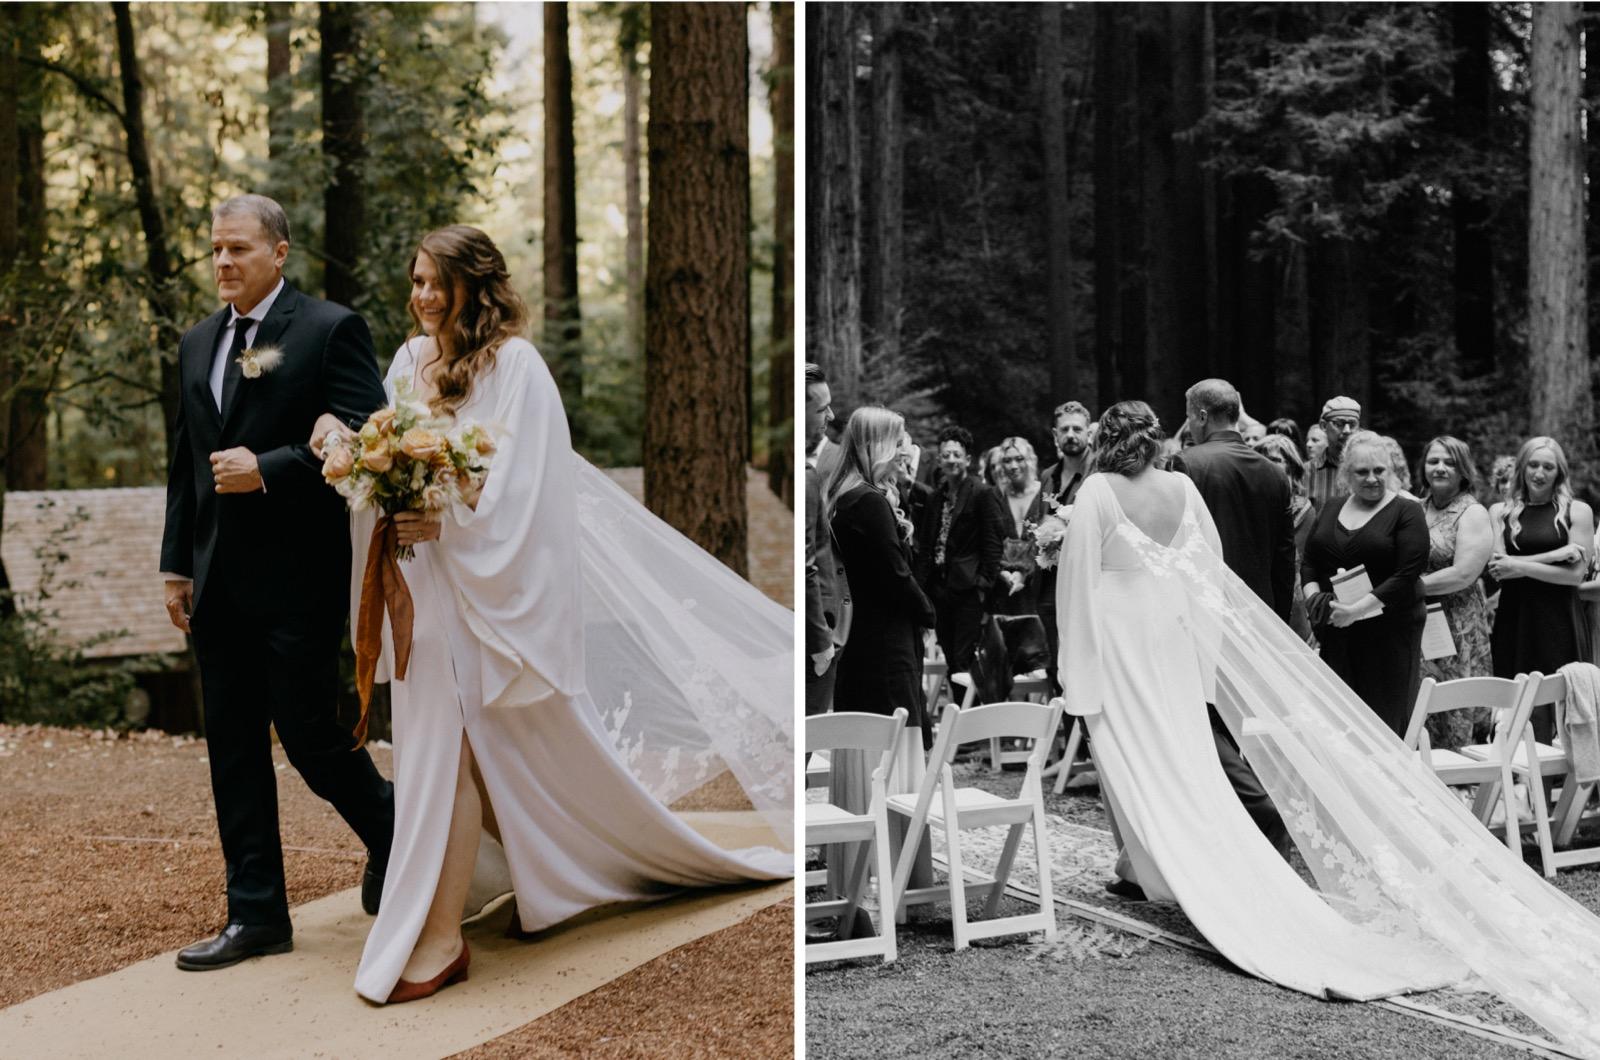 058_Emily & Jeff Wedding 0600_Emily & Jeff Wedding 0597_the-waterfall-lodge_forest_wedding_ben-lomond_intimate